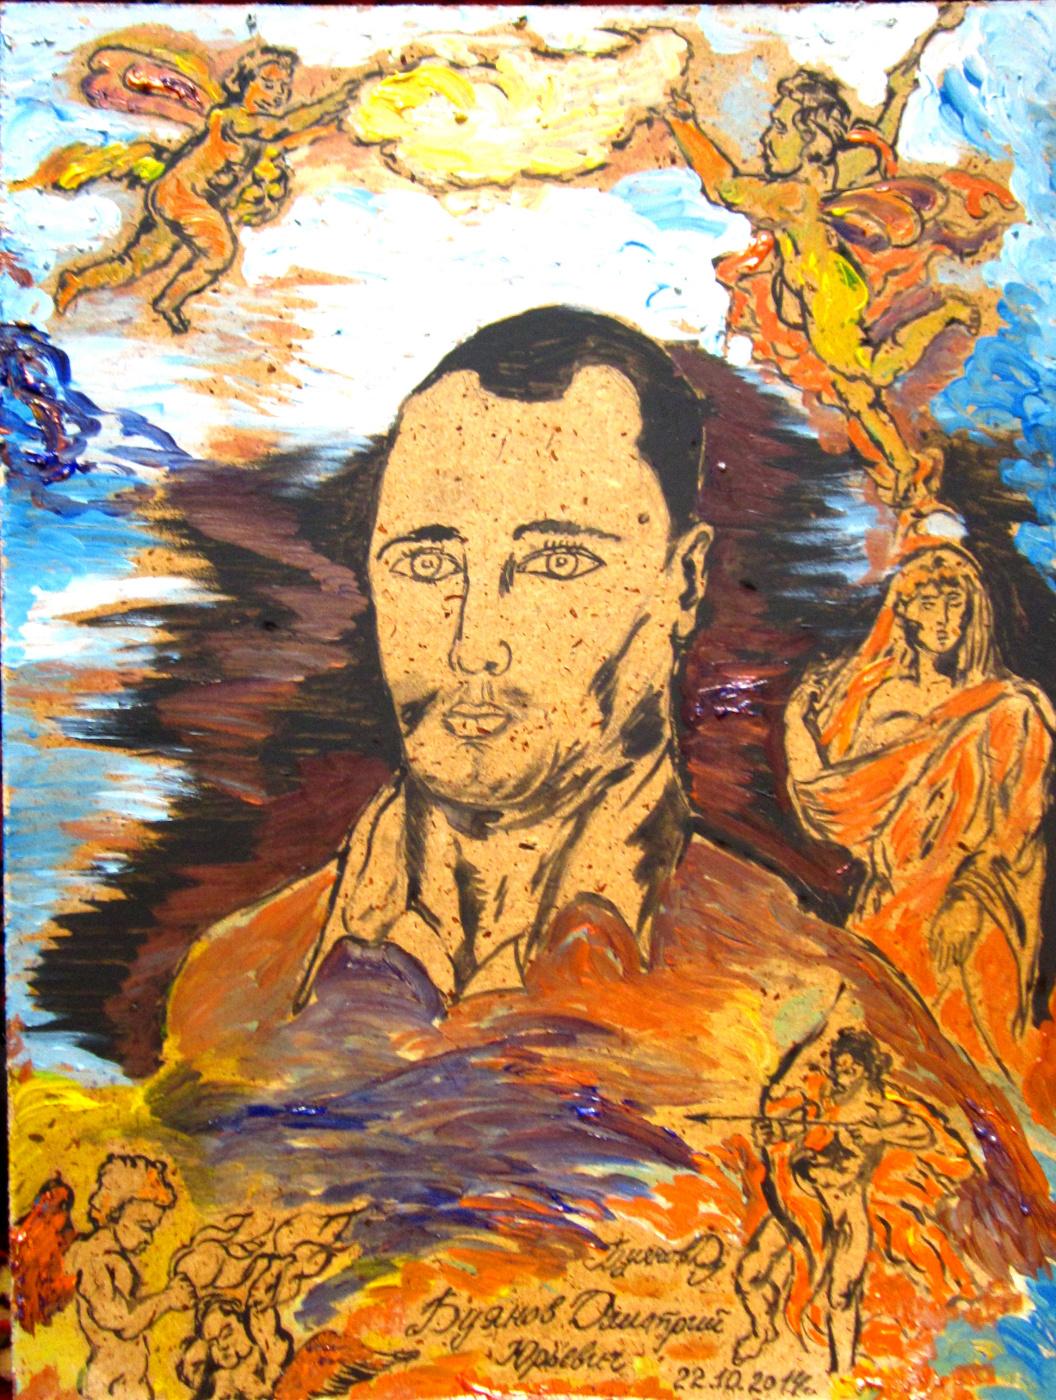 Дмитрий Юрьевич Буянов. A Self-Portrait Of The Artist Dmitry Buyanova